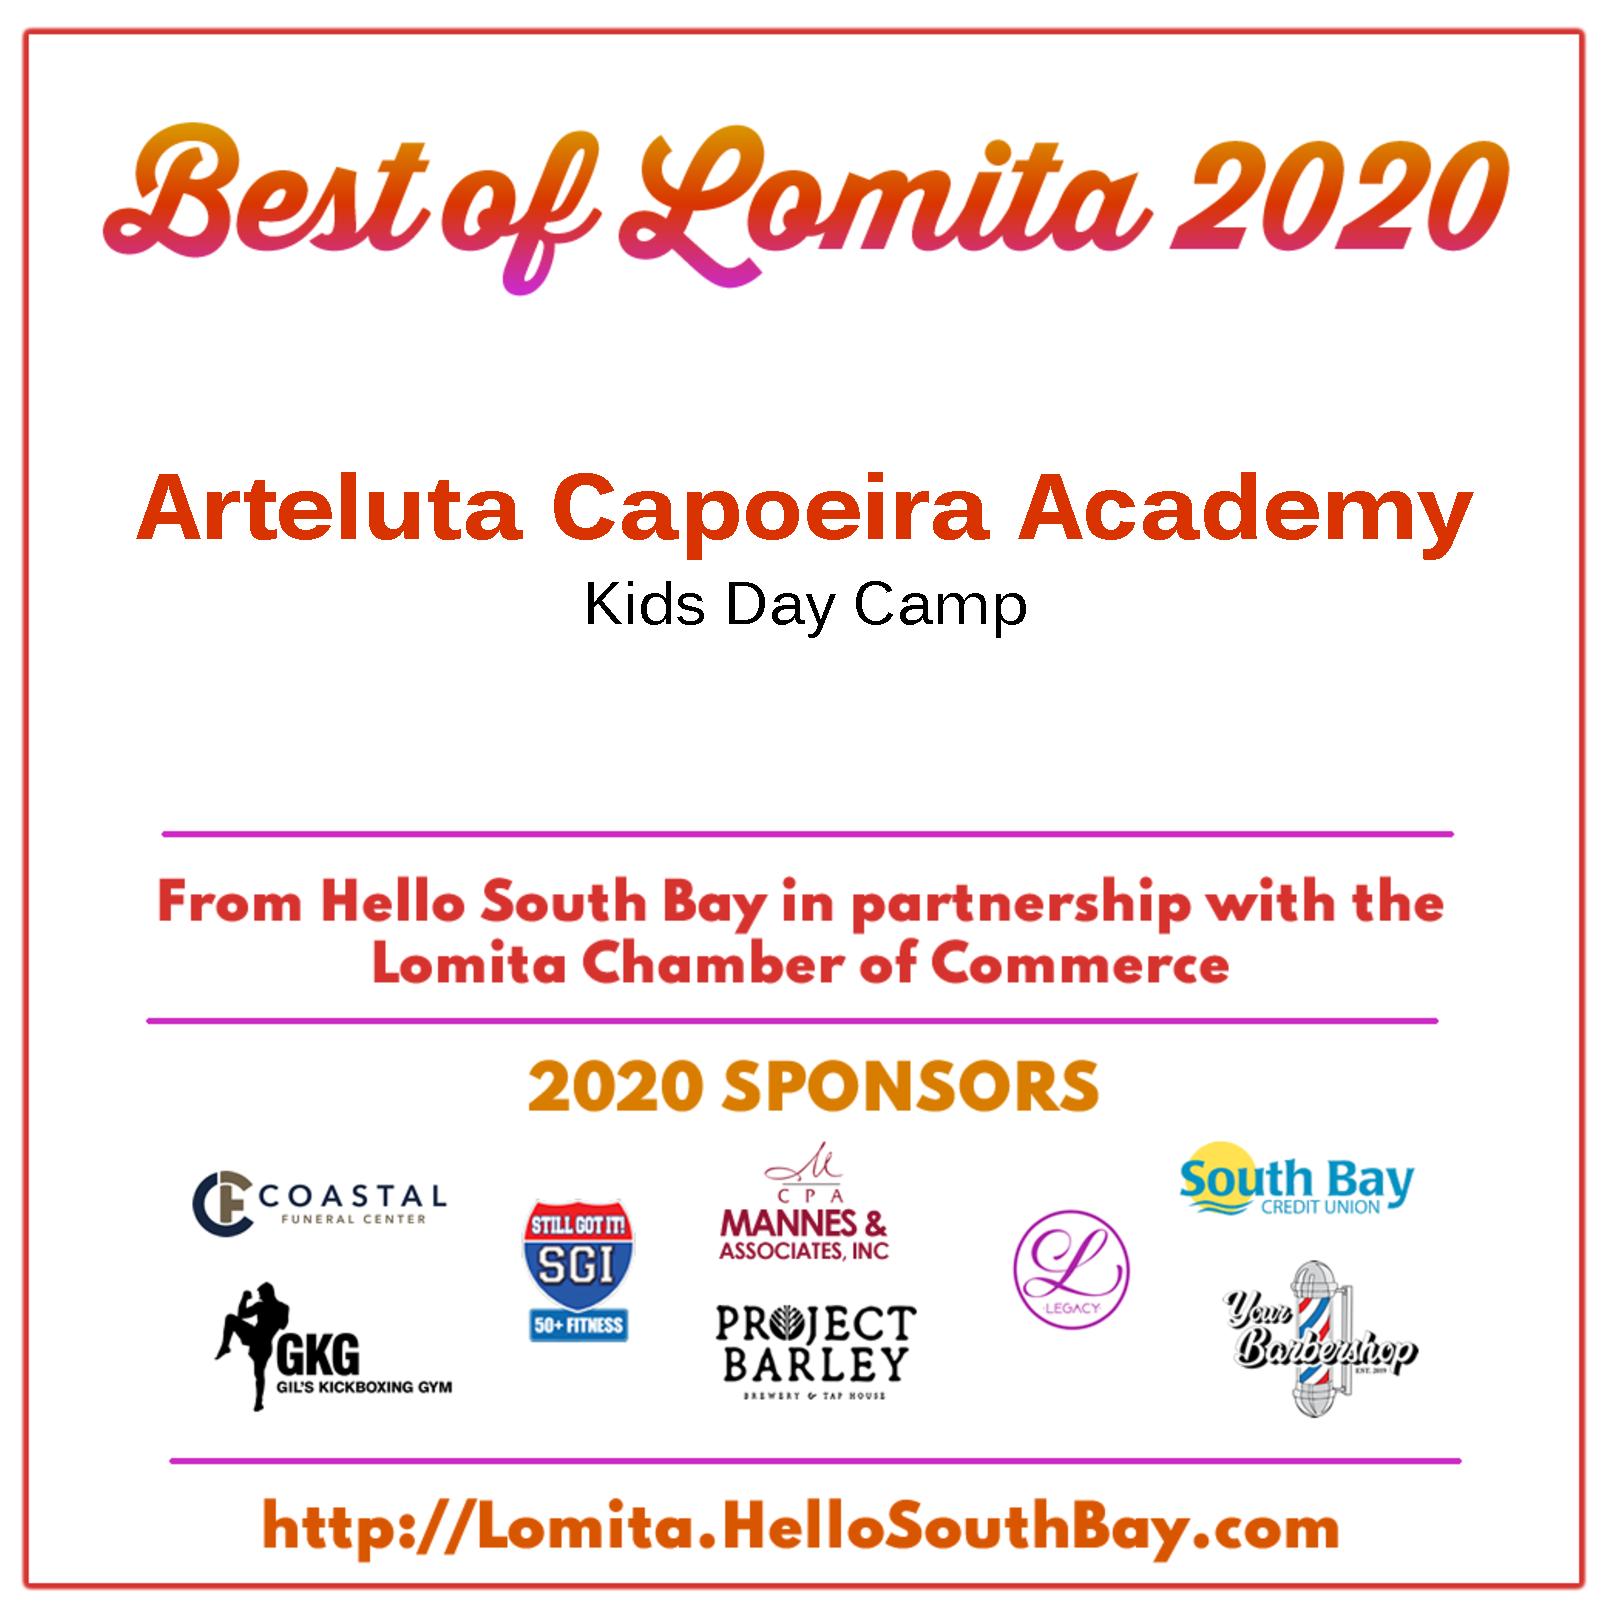 Best of Lomita Award